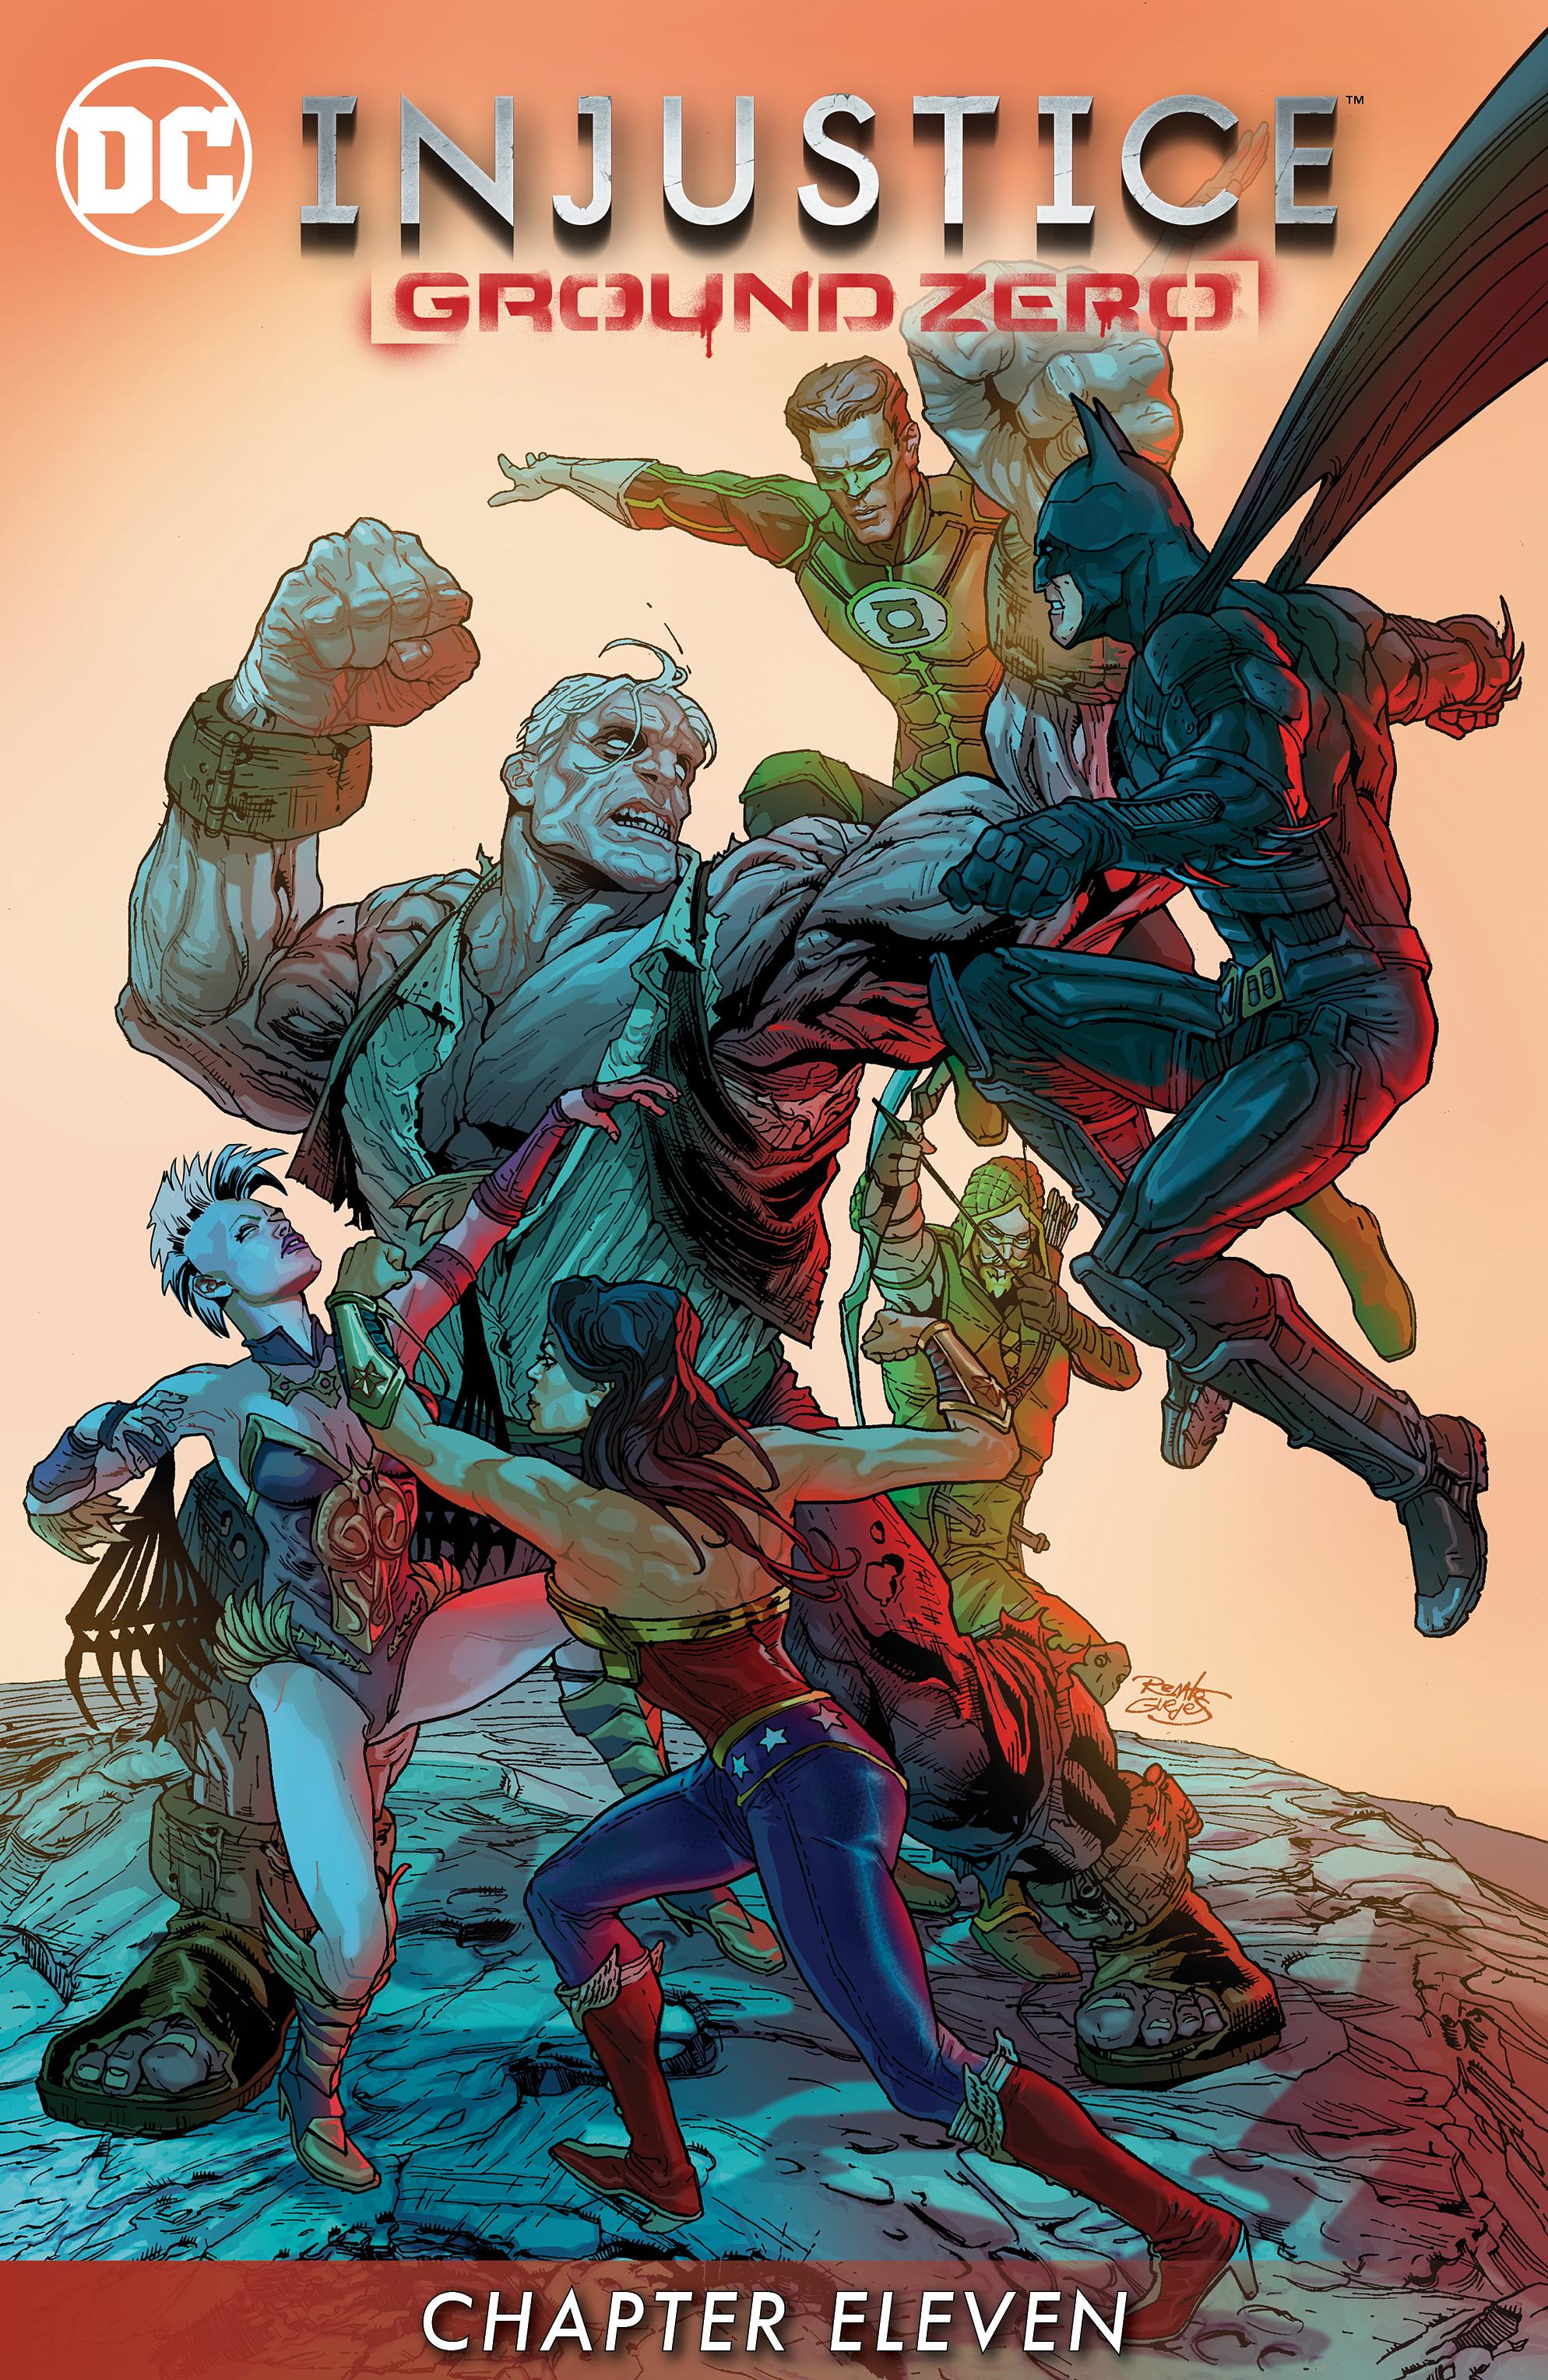 Read online Injustice: Ground Zero comic -  Issue #11 - 2